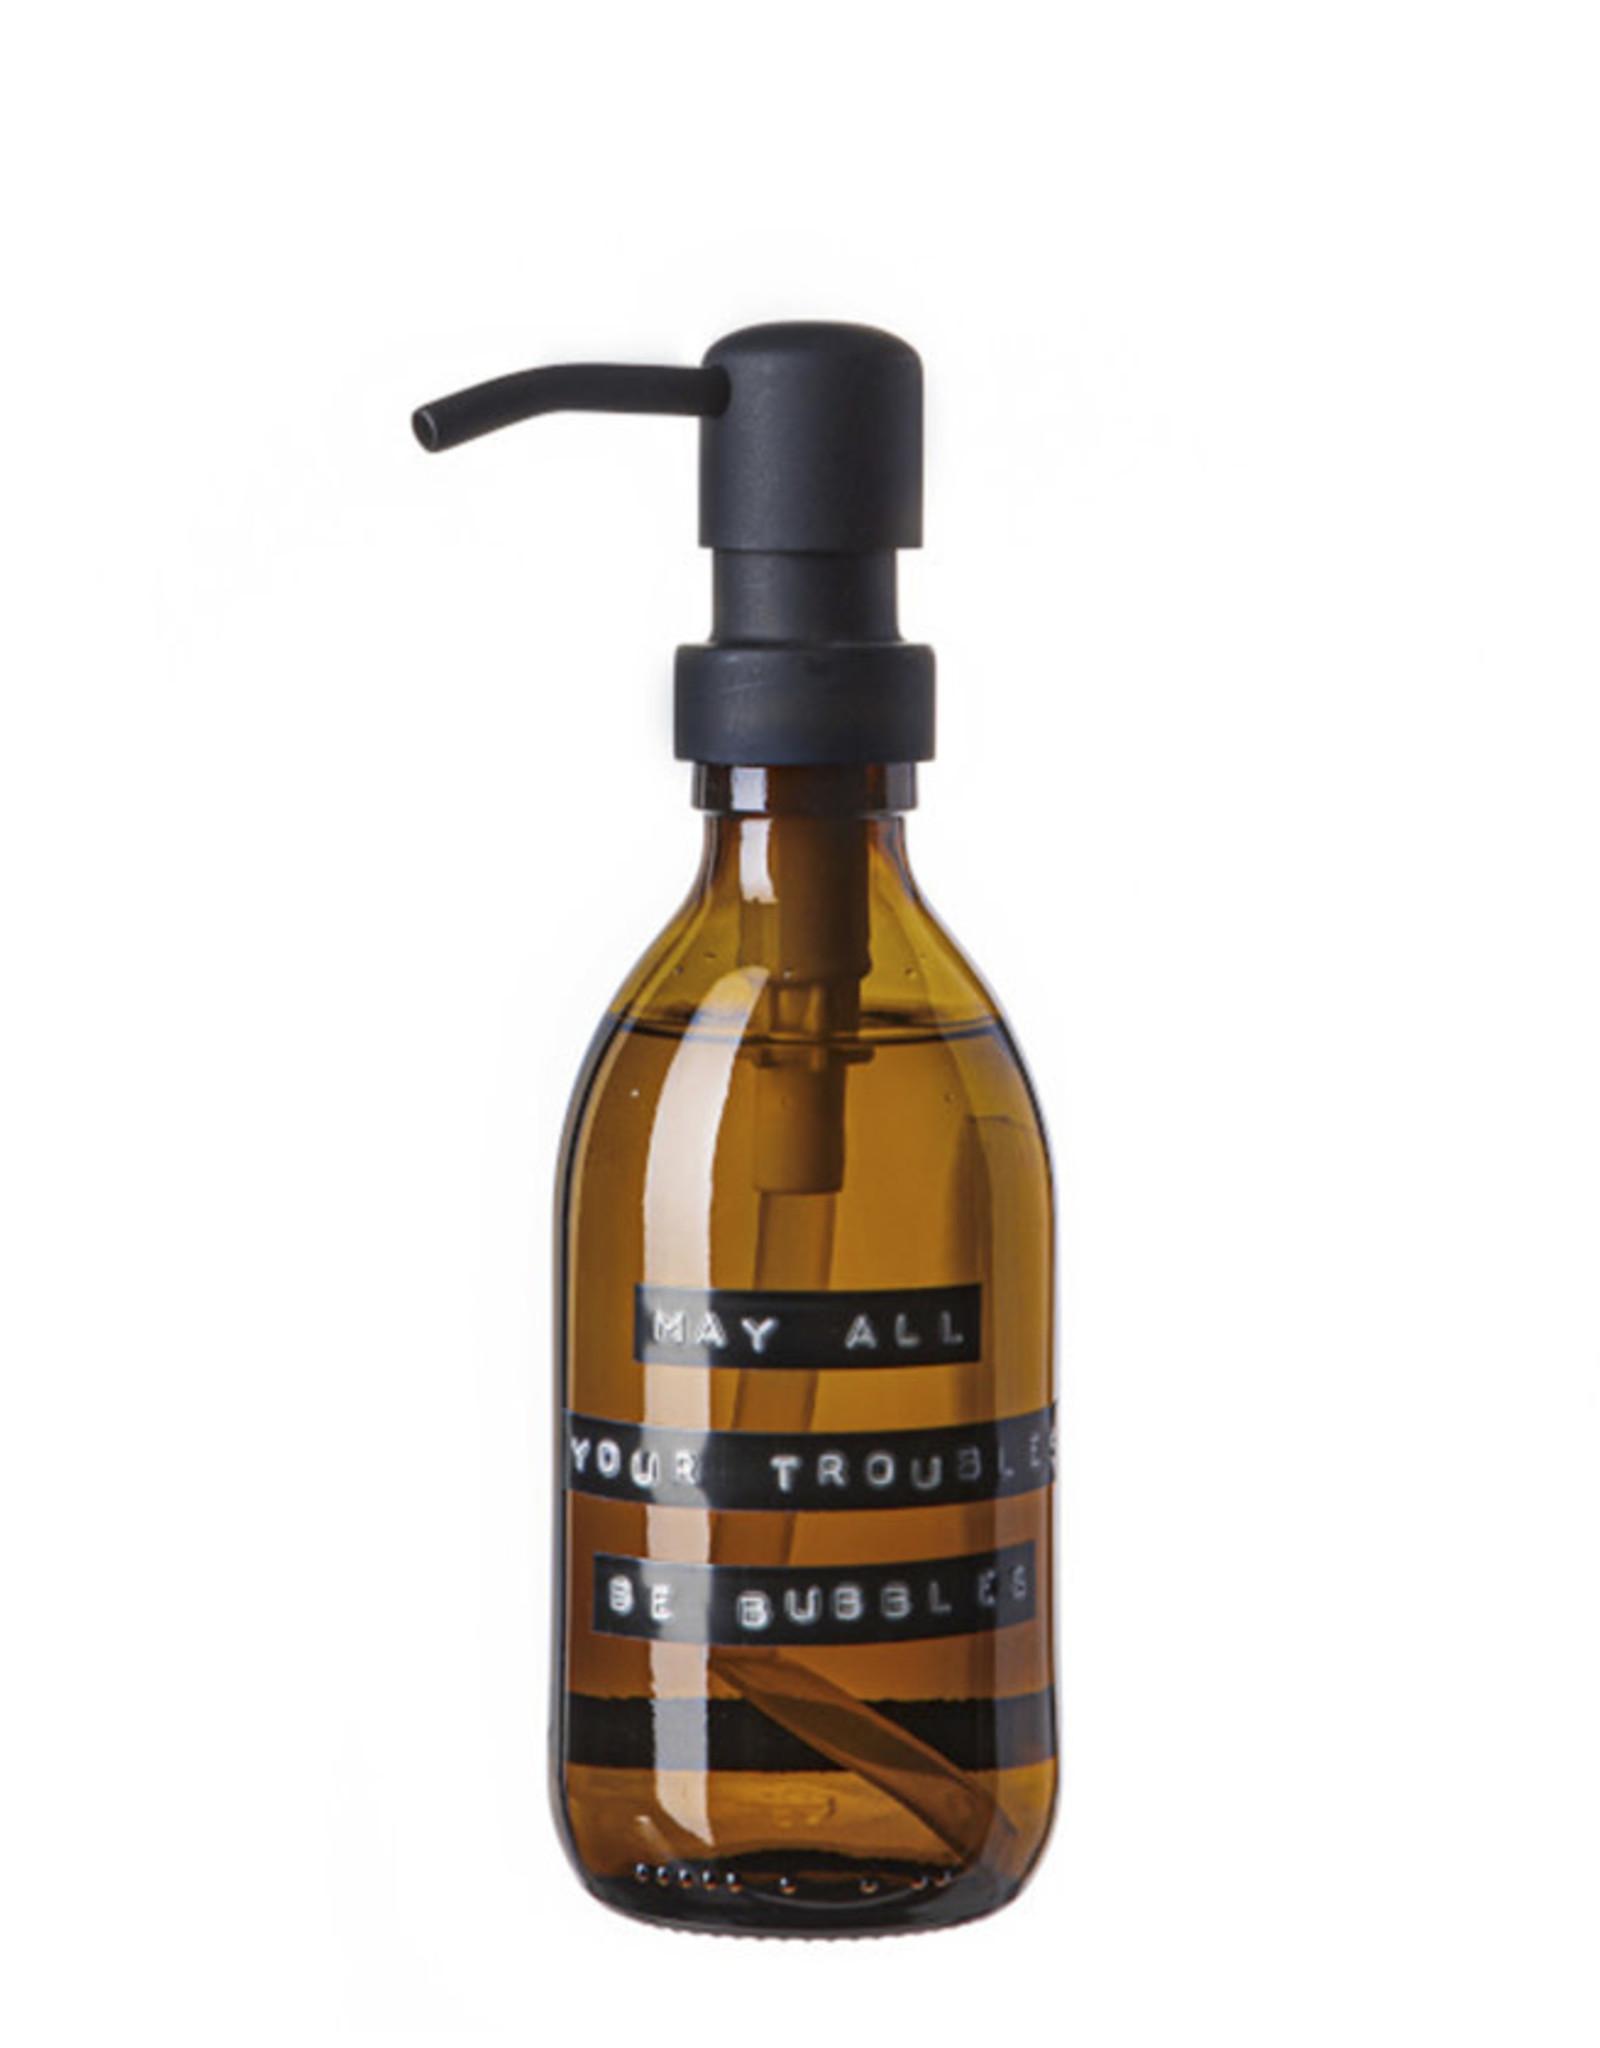 Wellmark Handzeep bruin glas /zwarte pomp 250ml-may all your troubles be bubbles